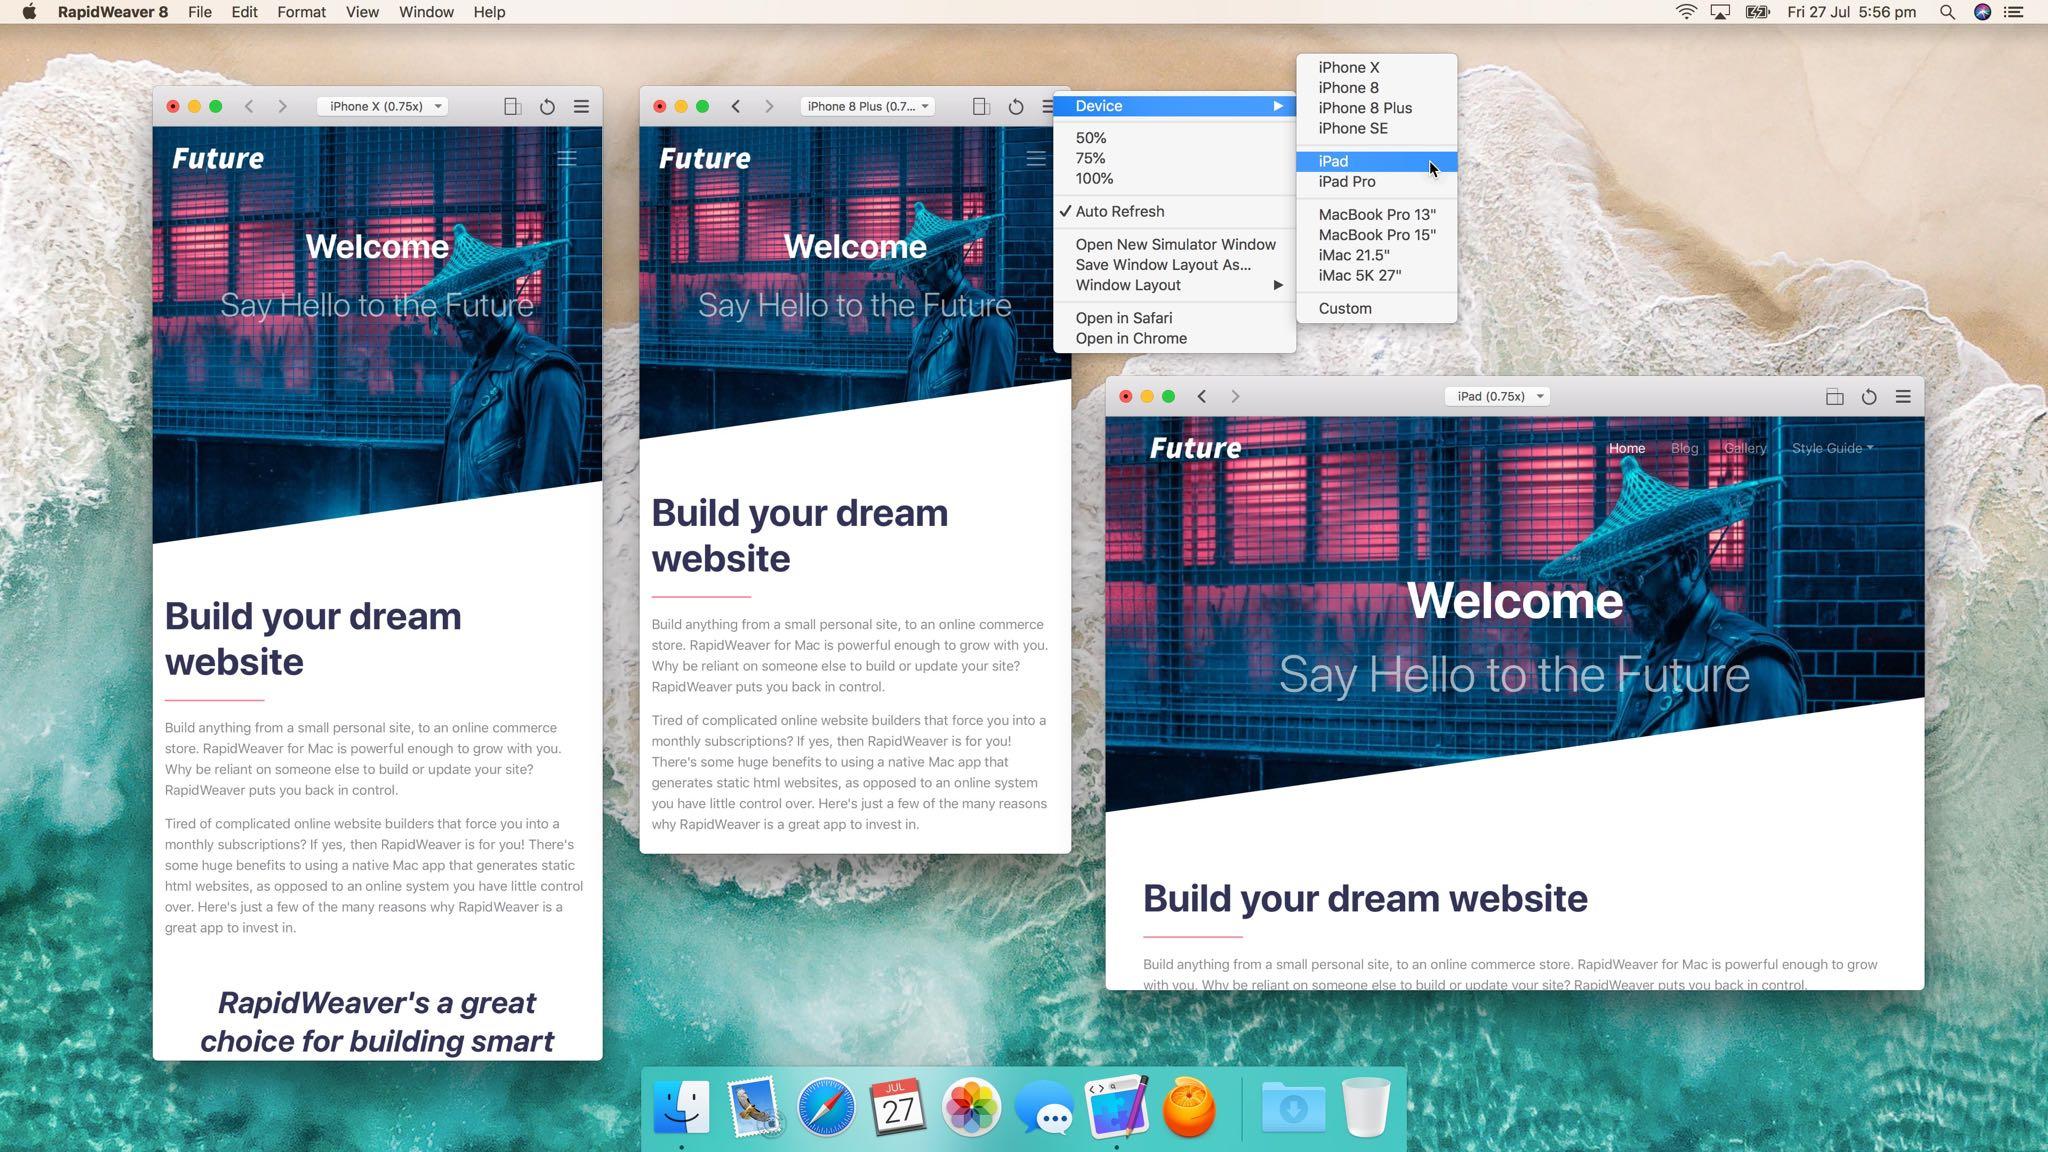 RapidWeaver 8 for Mac arrives: building your dream website just got